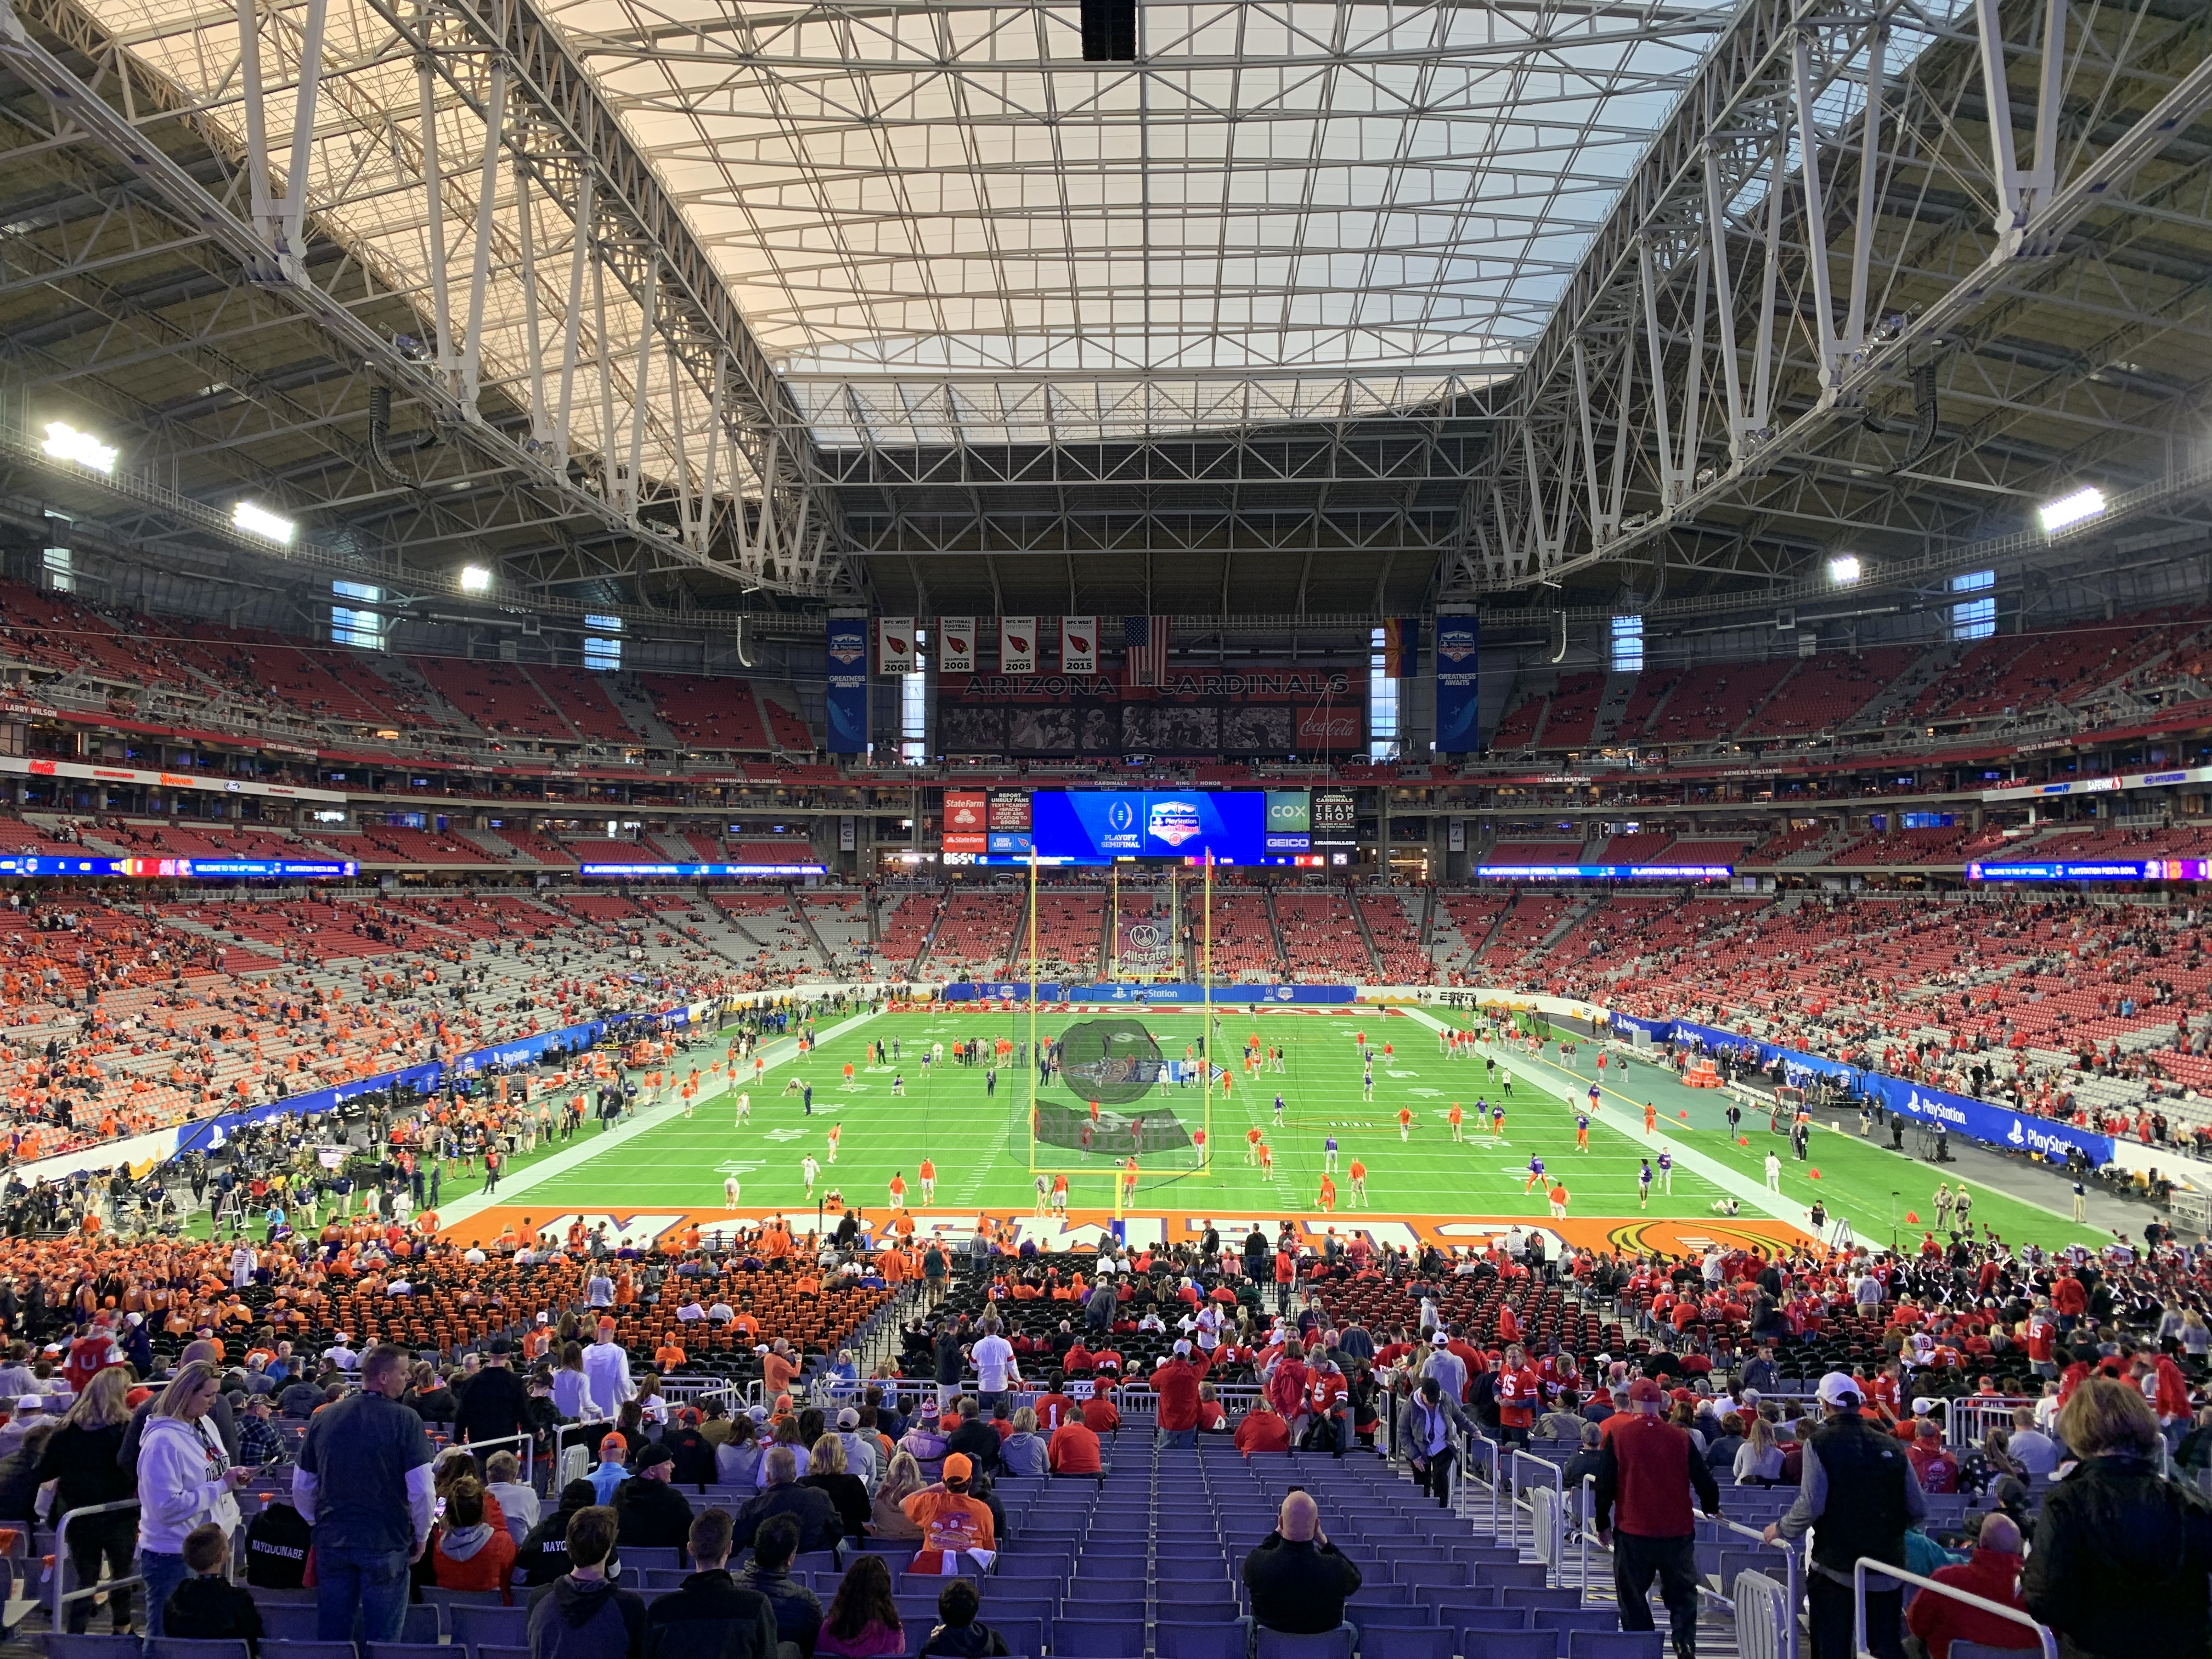 Fiesta Bowl 2019 Stadium.jpg